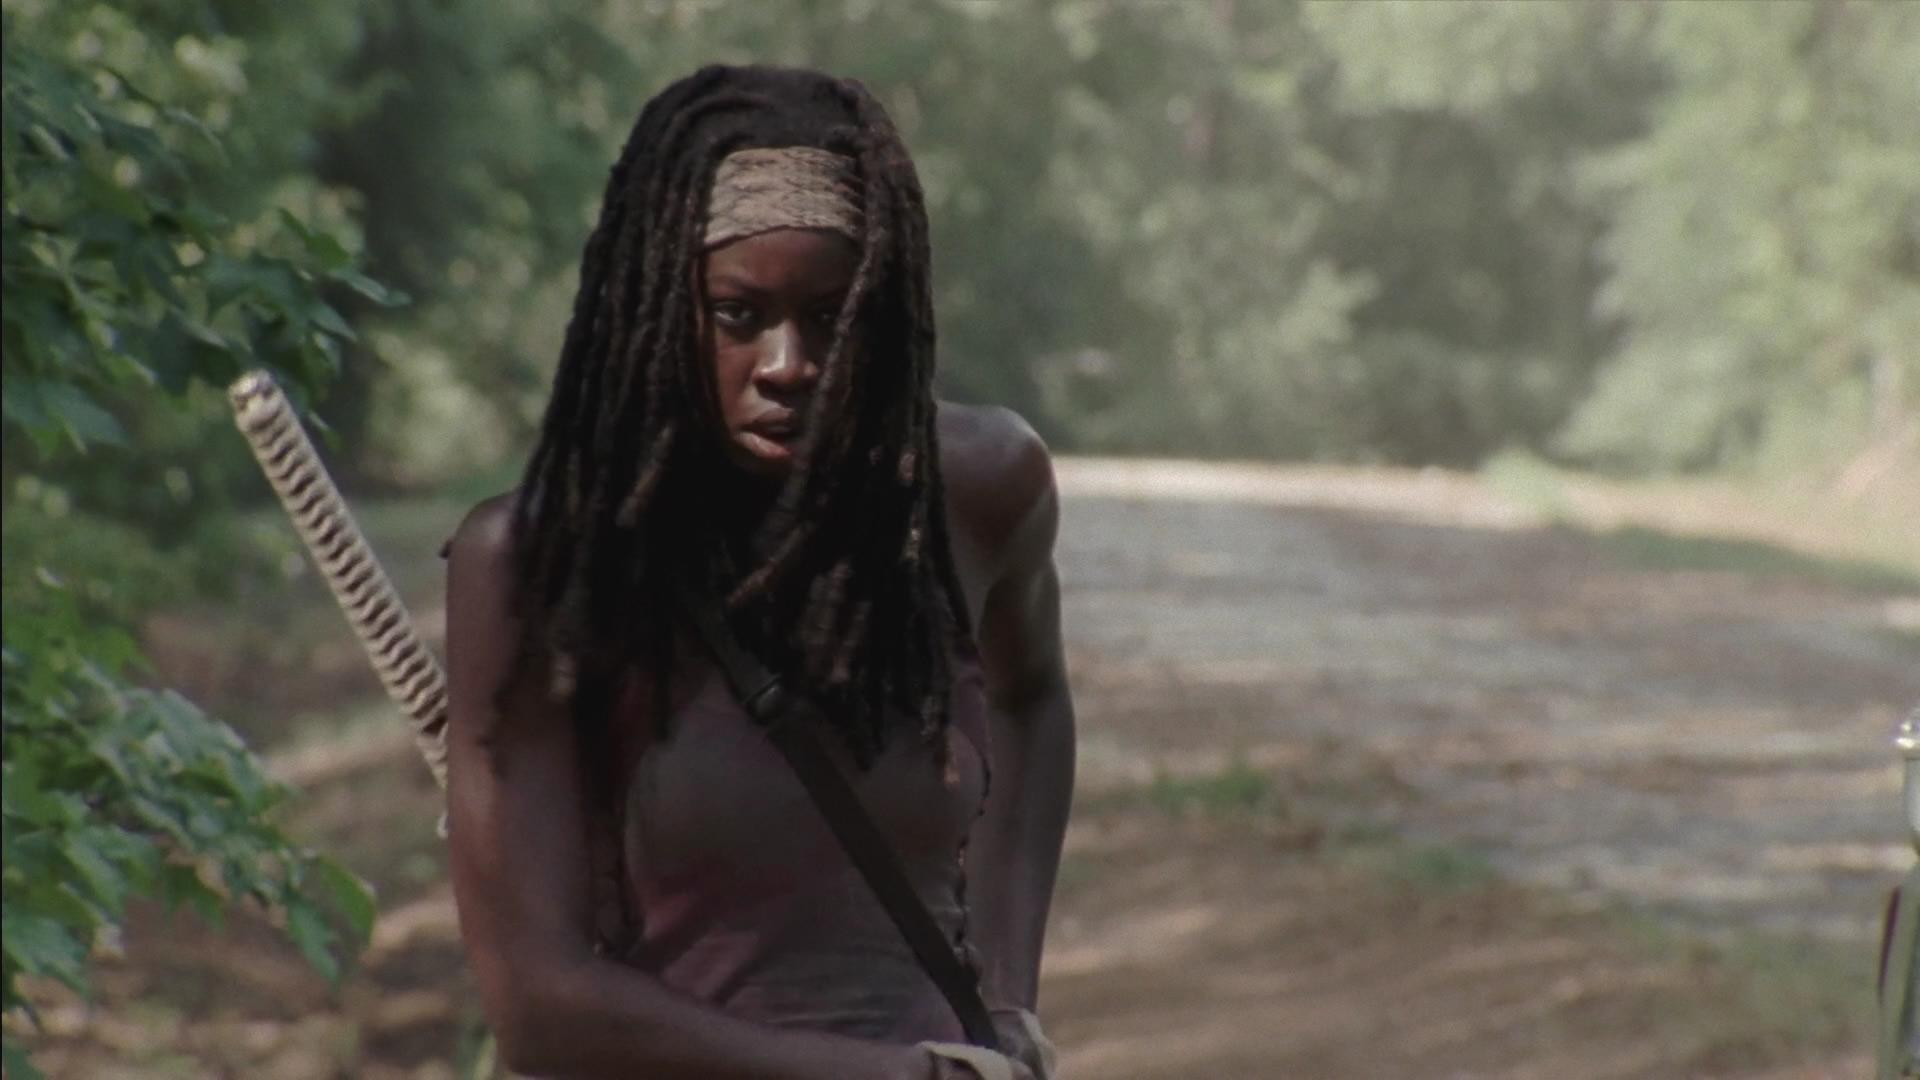 'The Walking Dead' Season 3 Episode 7 Captures